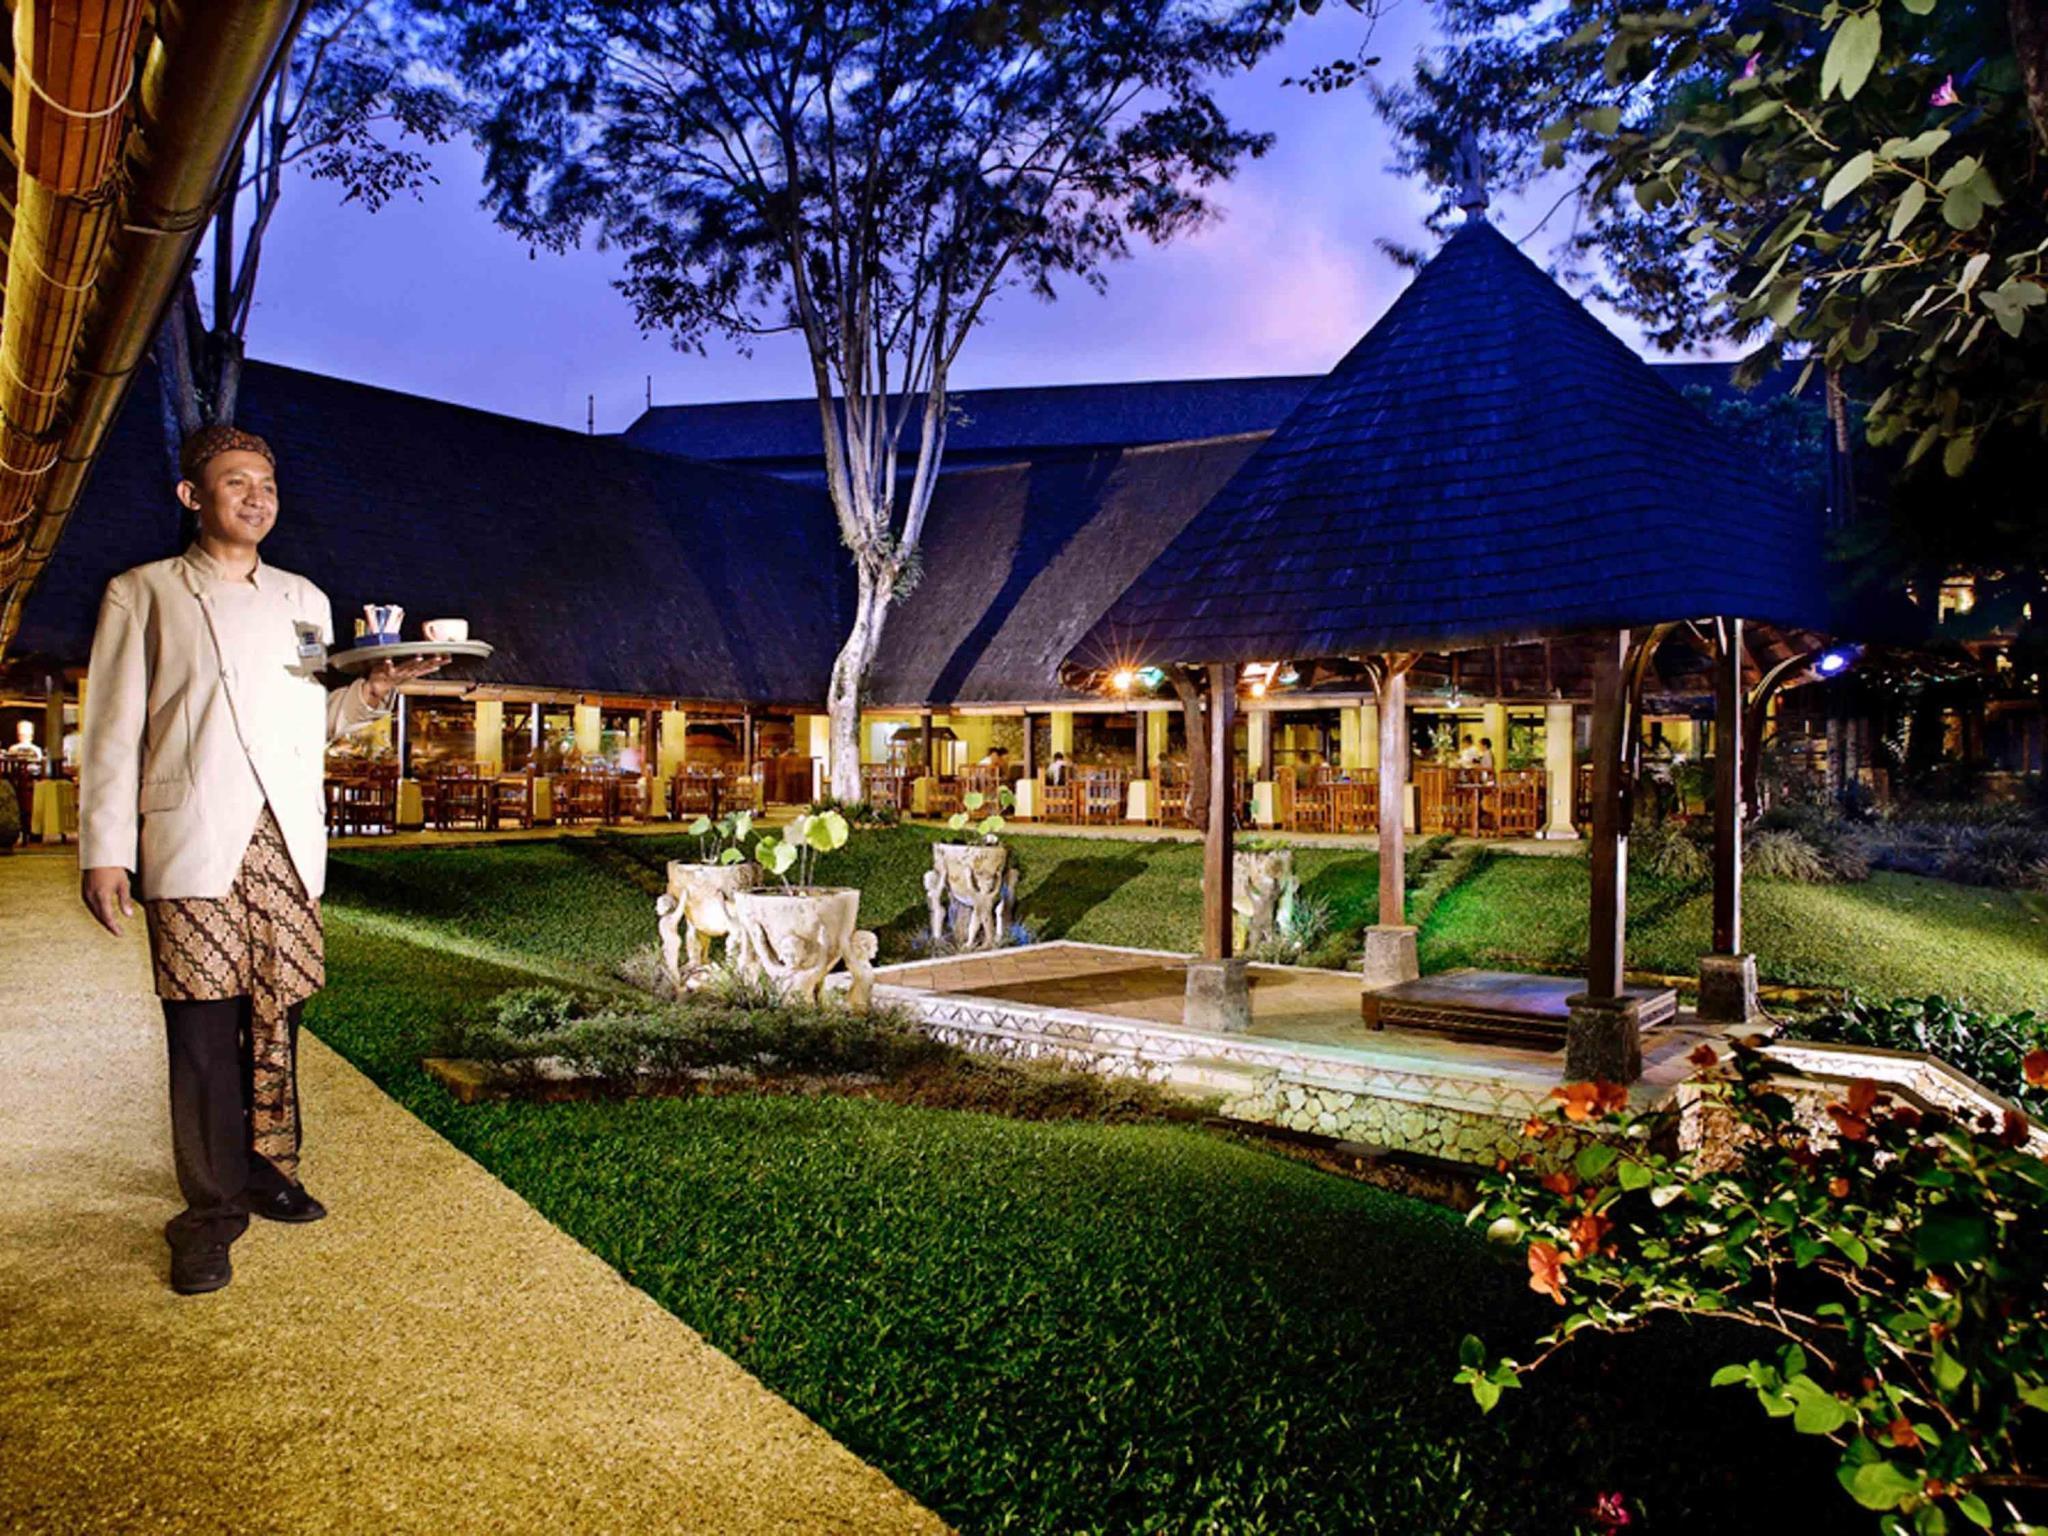 Novotel Bogor Golf Resort & Conv. Center